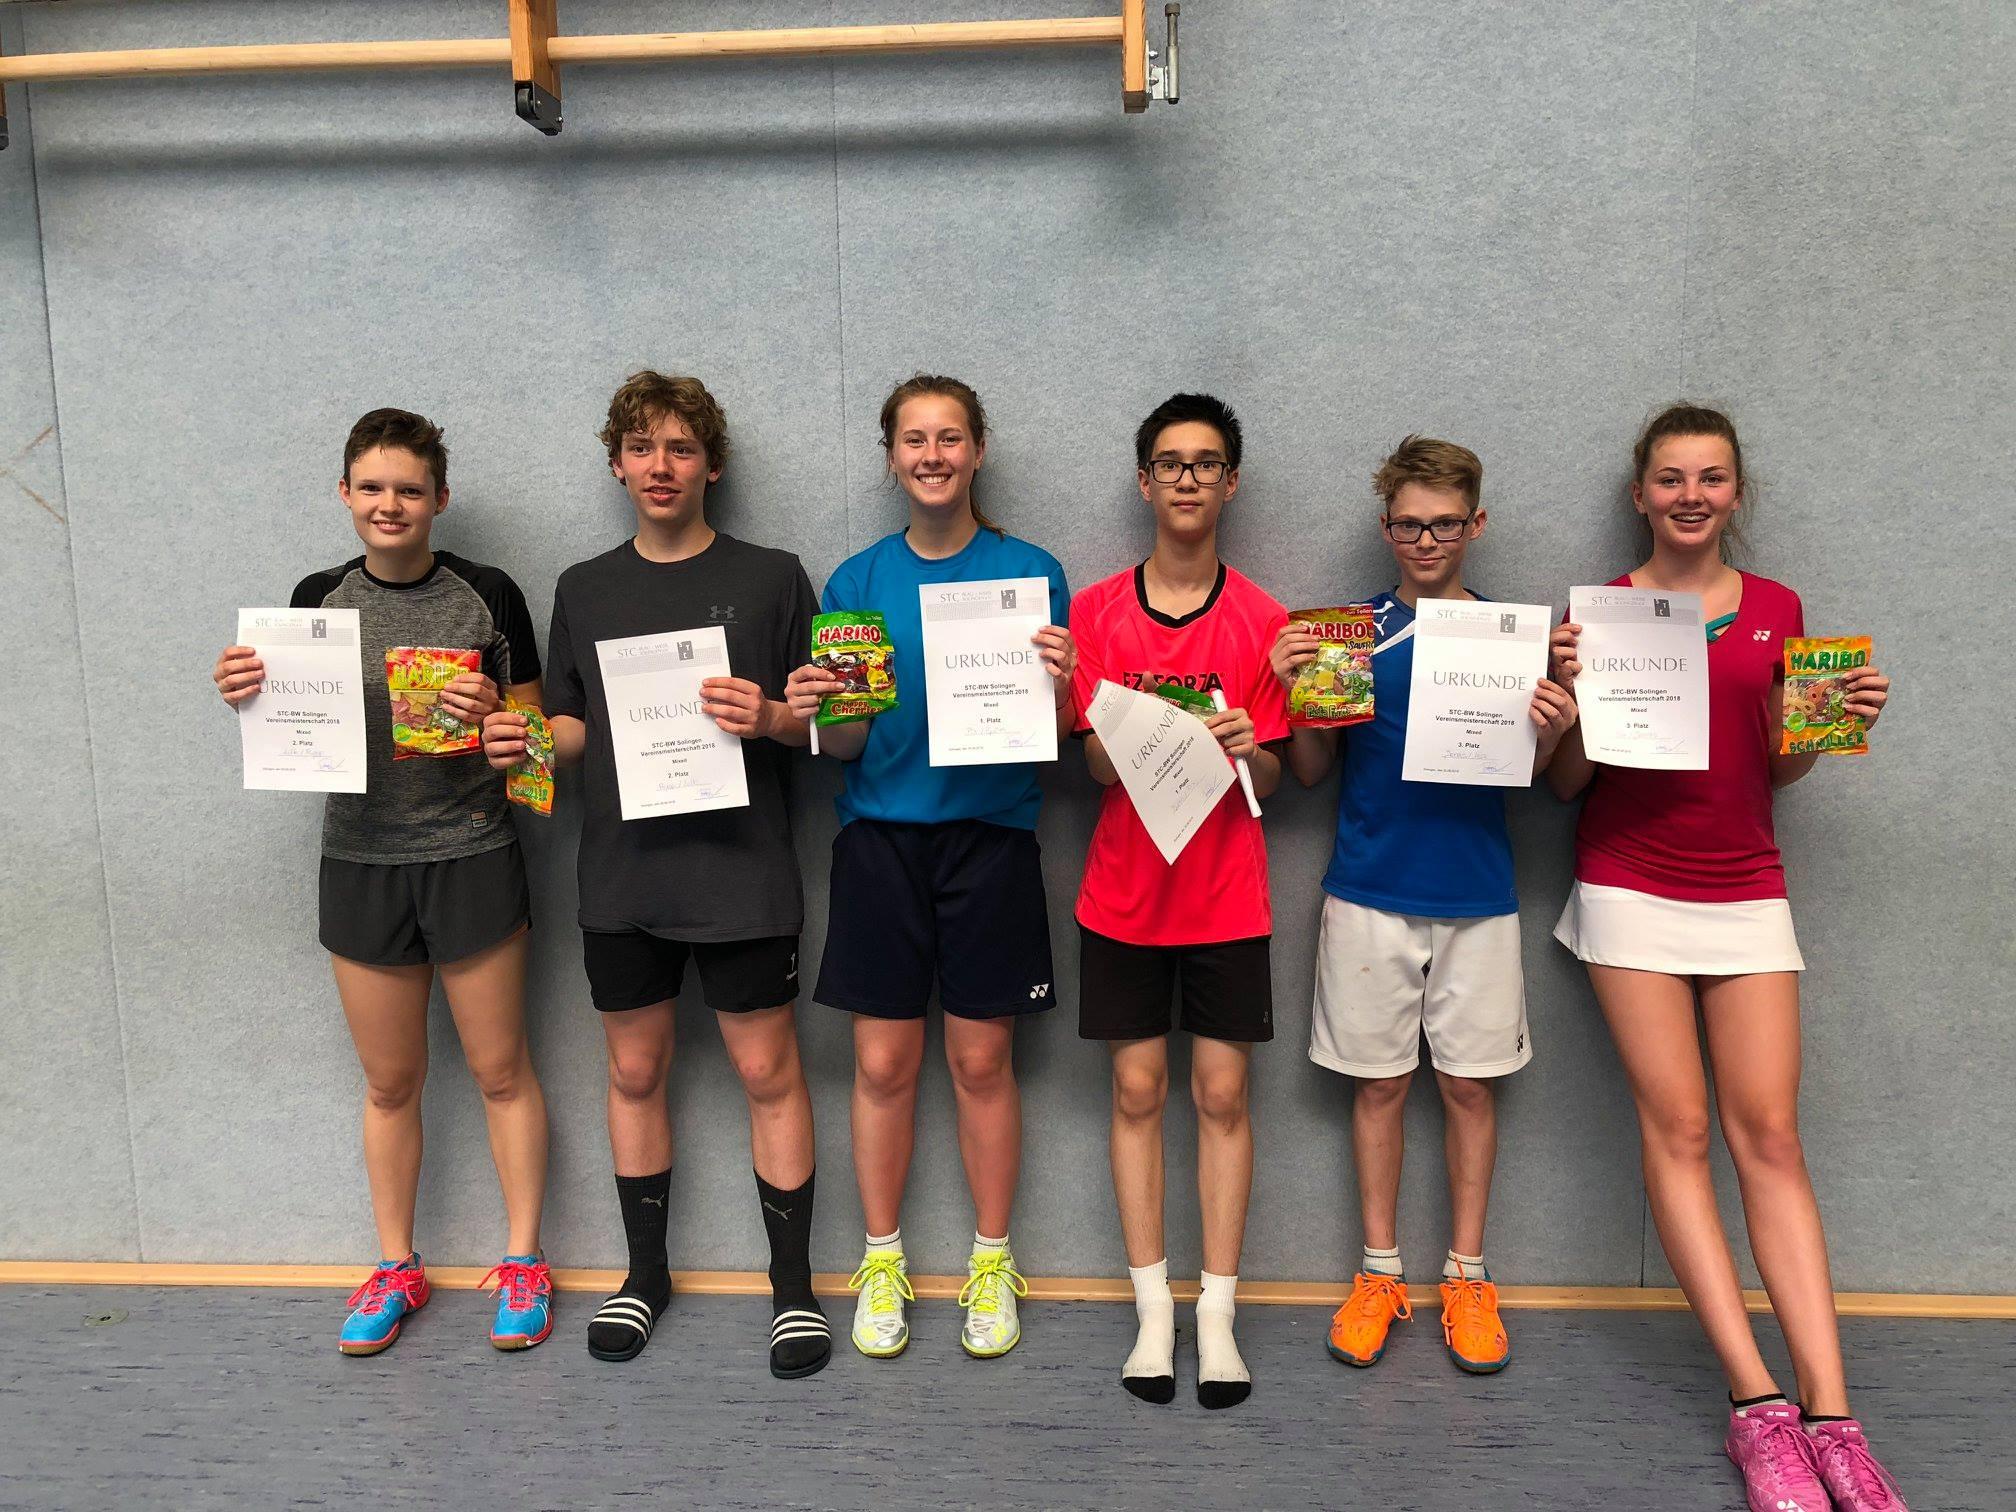 1. Platz Pia Reinkens Björn Braach 2. Platz Isabelle Kluk Jonas Düdden 3. Lotte Thomas Ringo Munsch